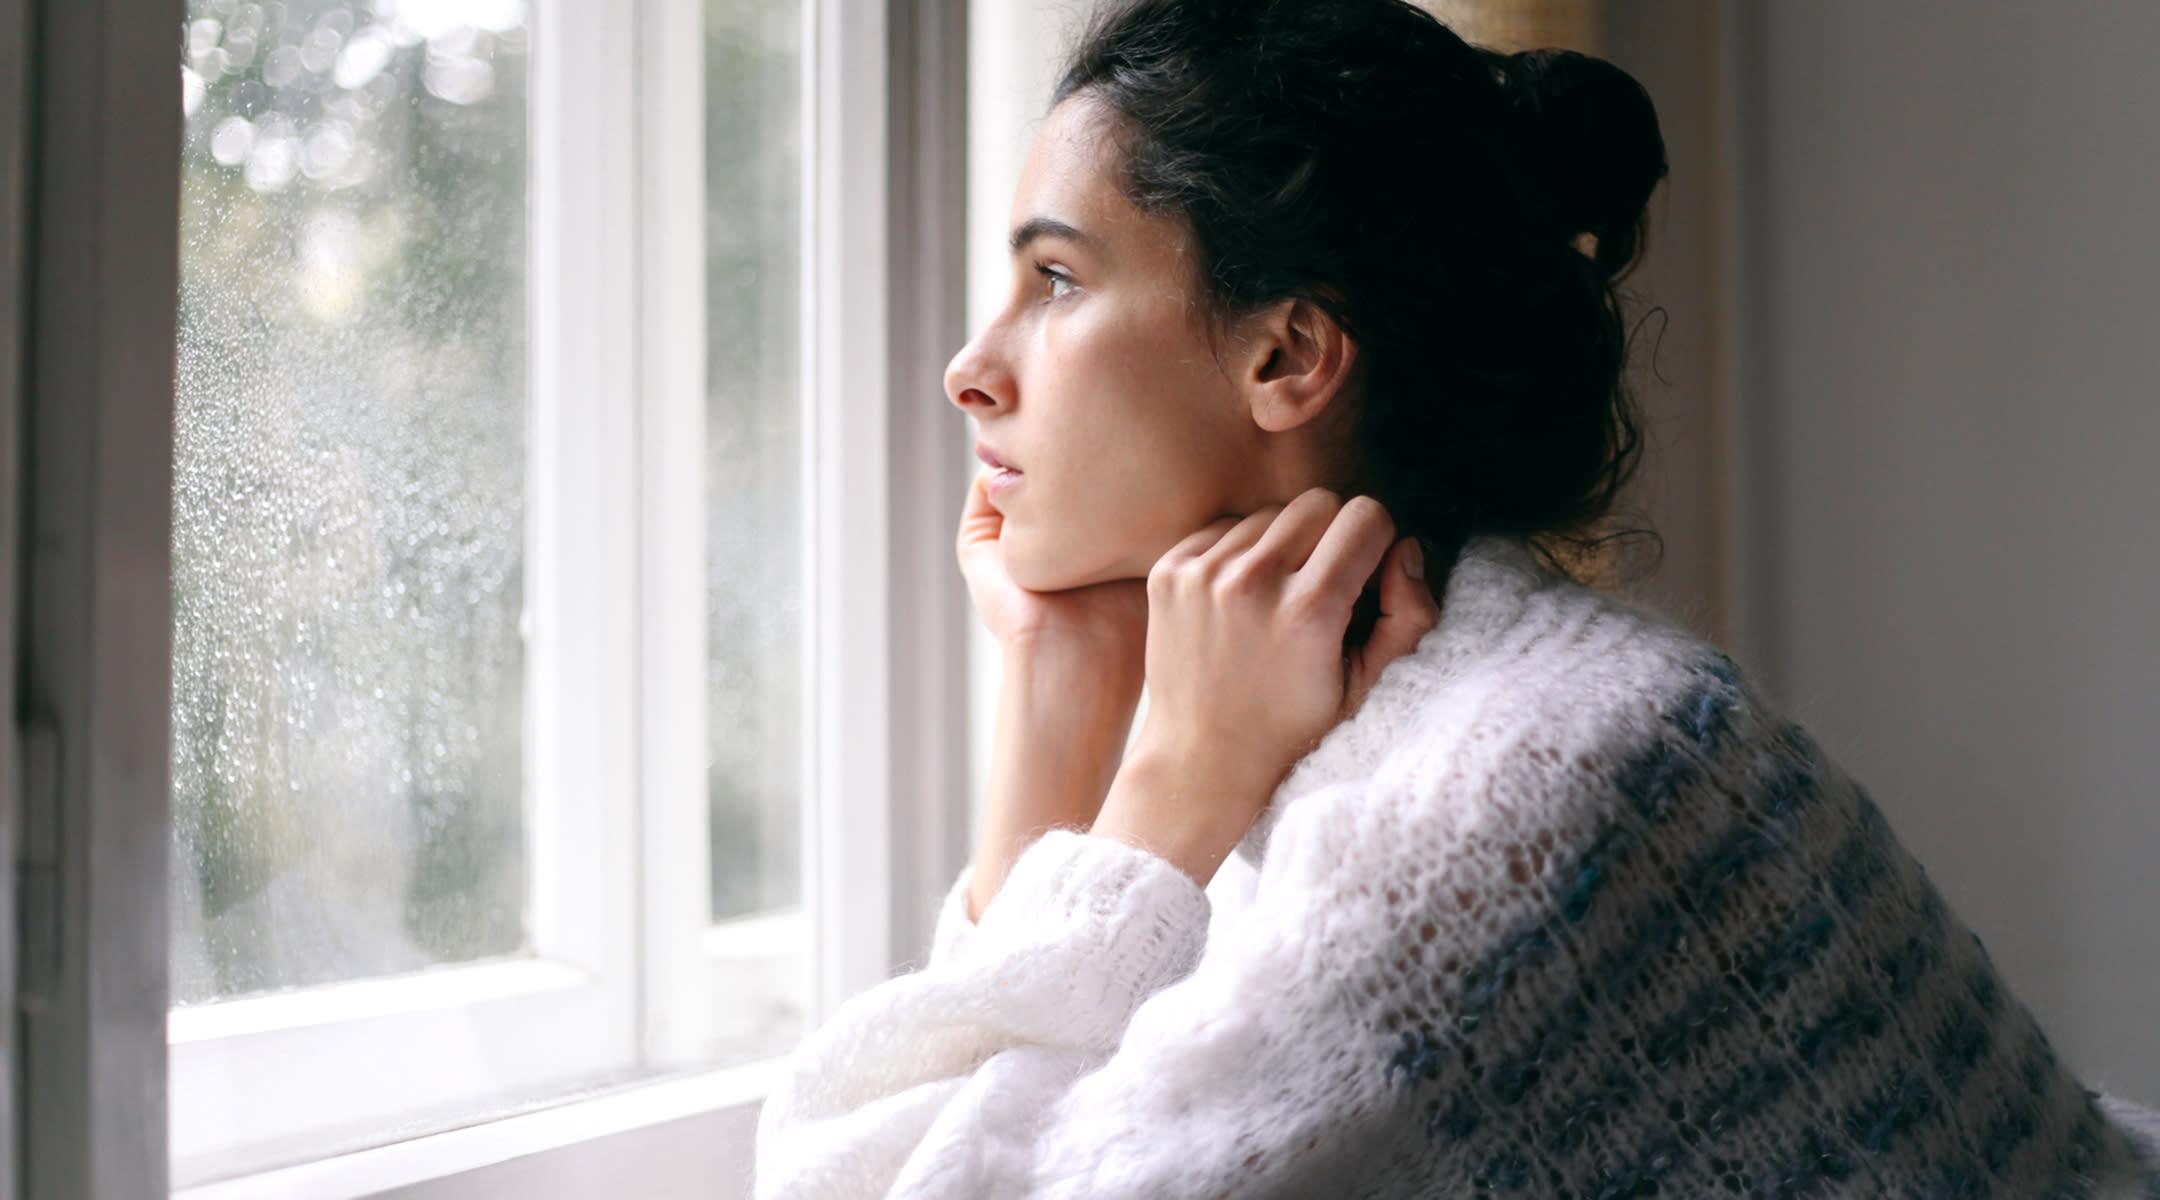 Woman with postpartum depression